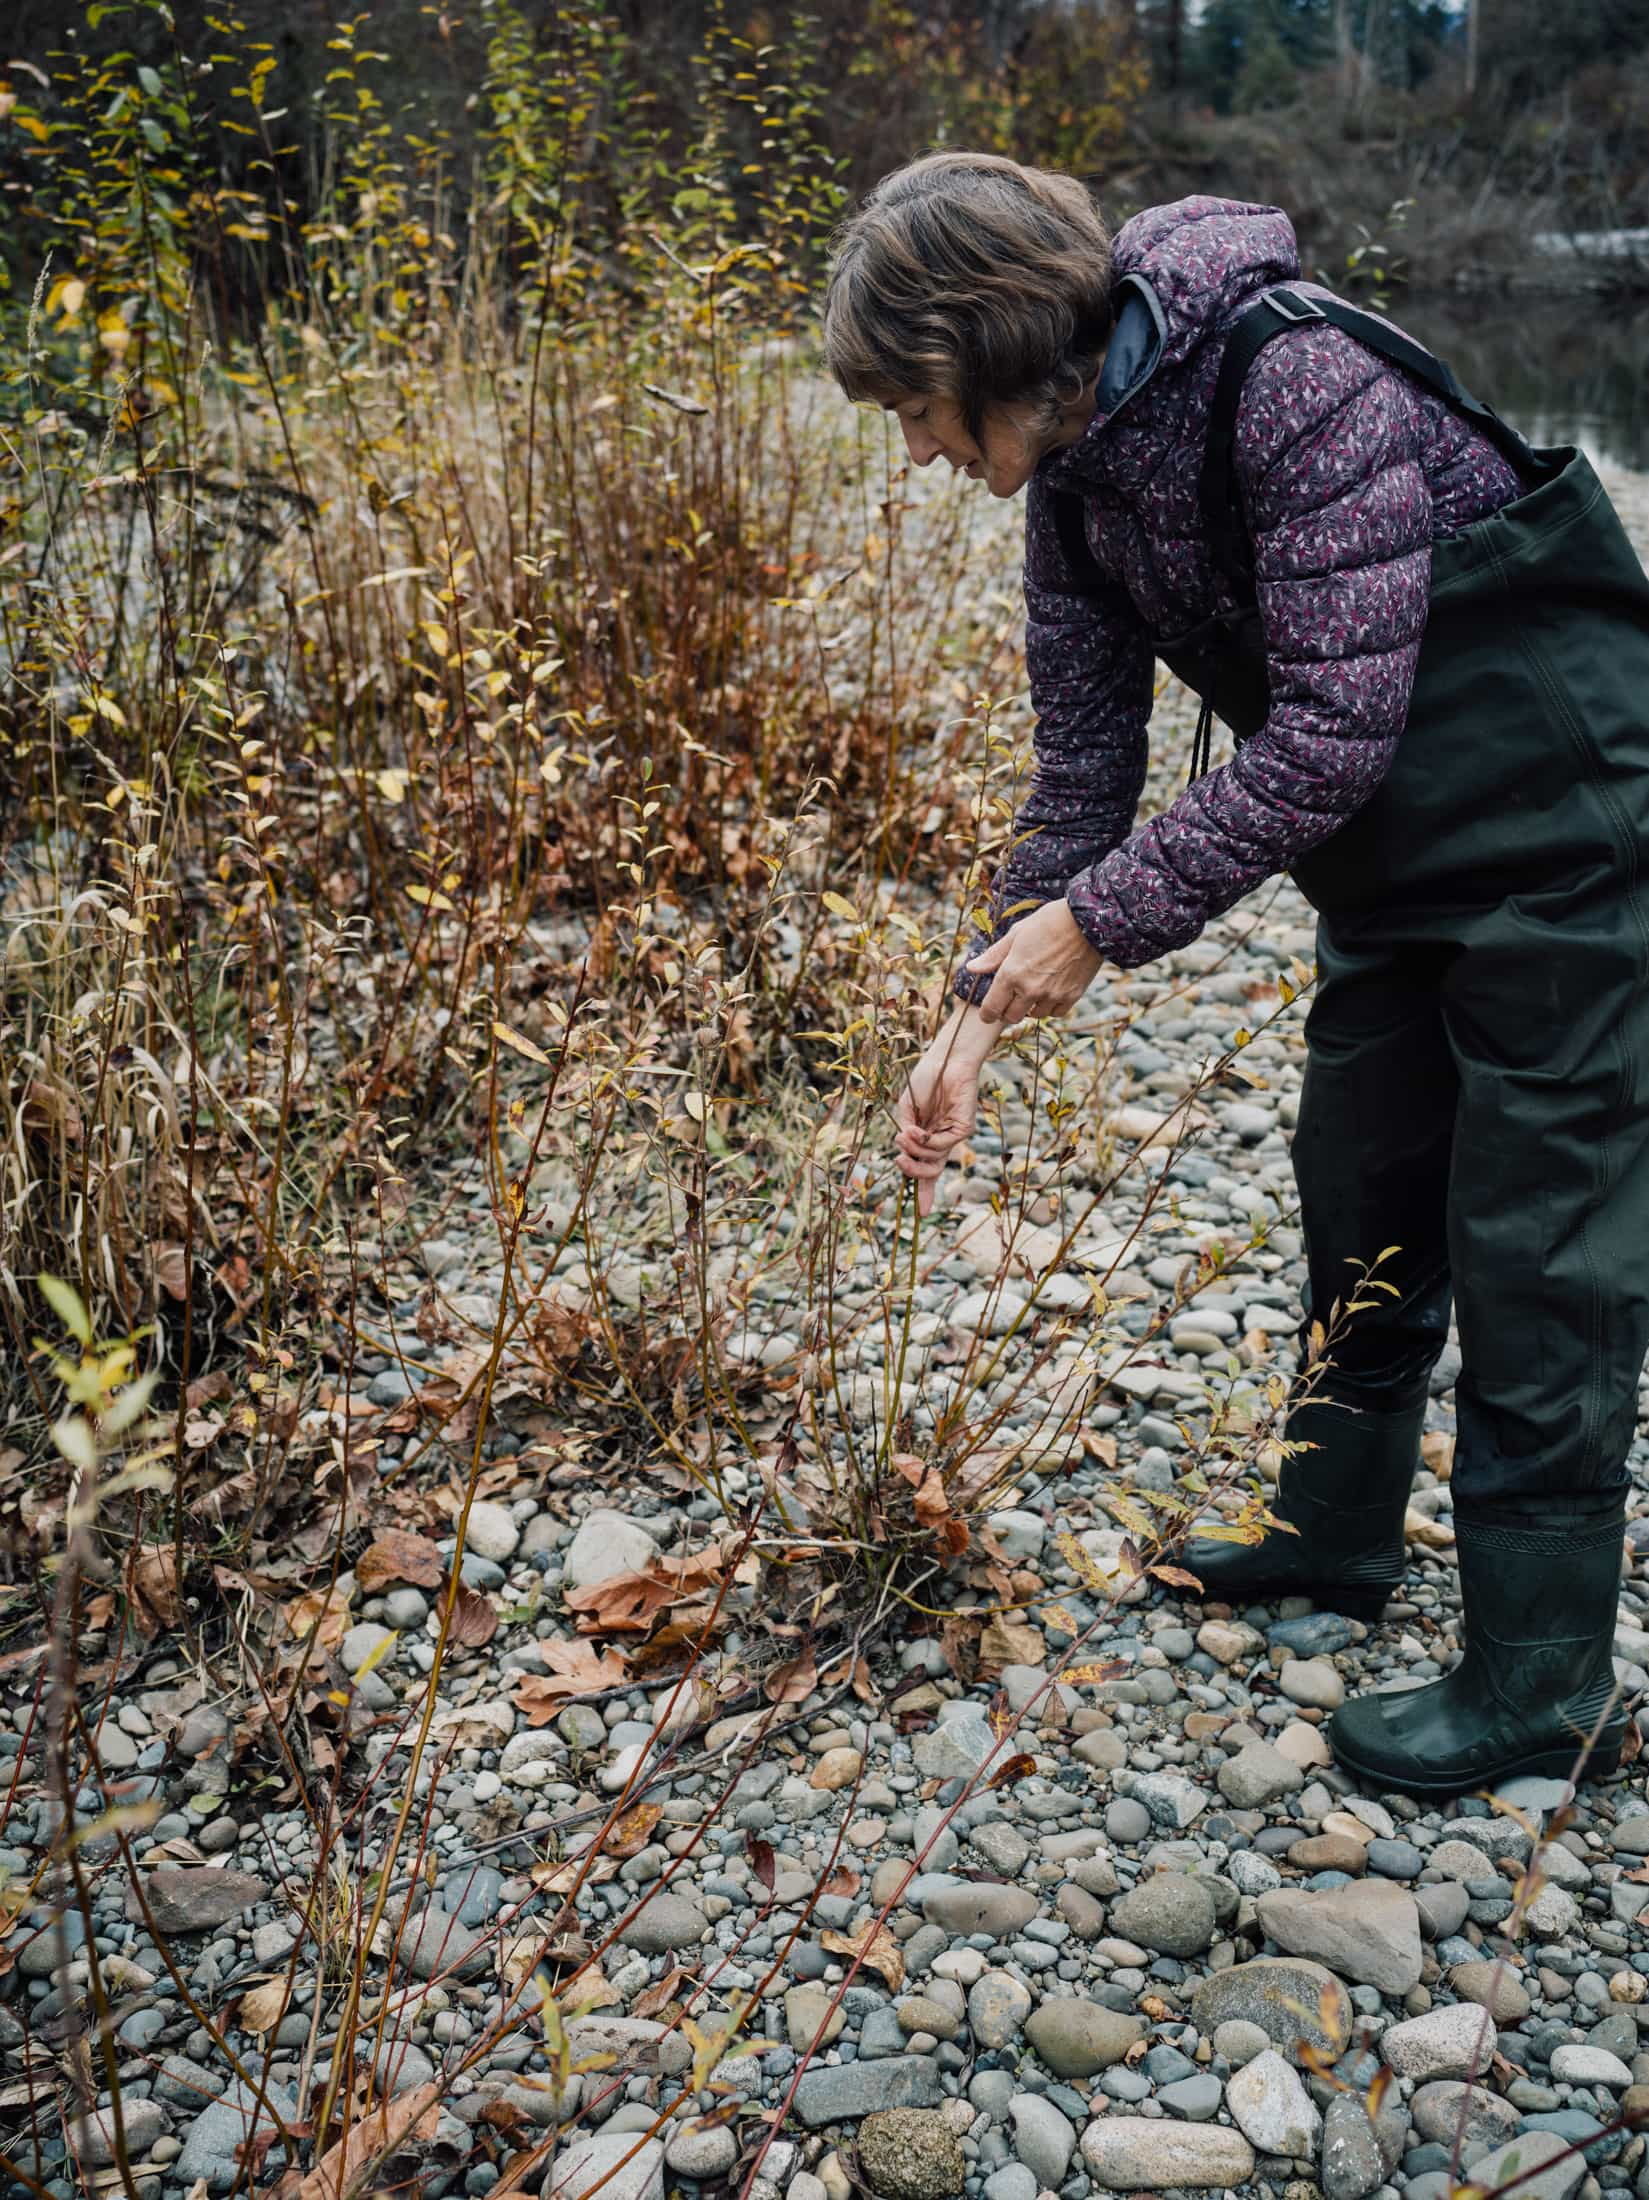 Tsolum River restoration